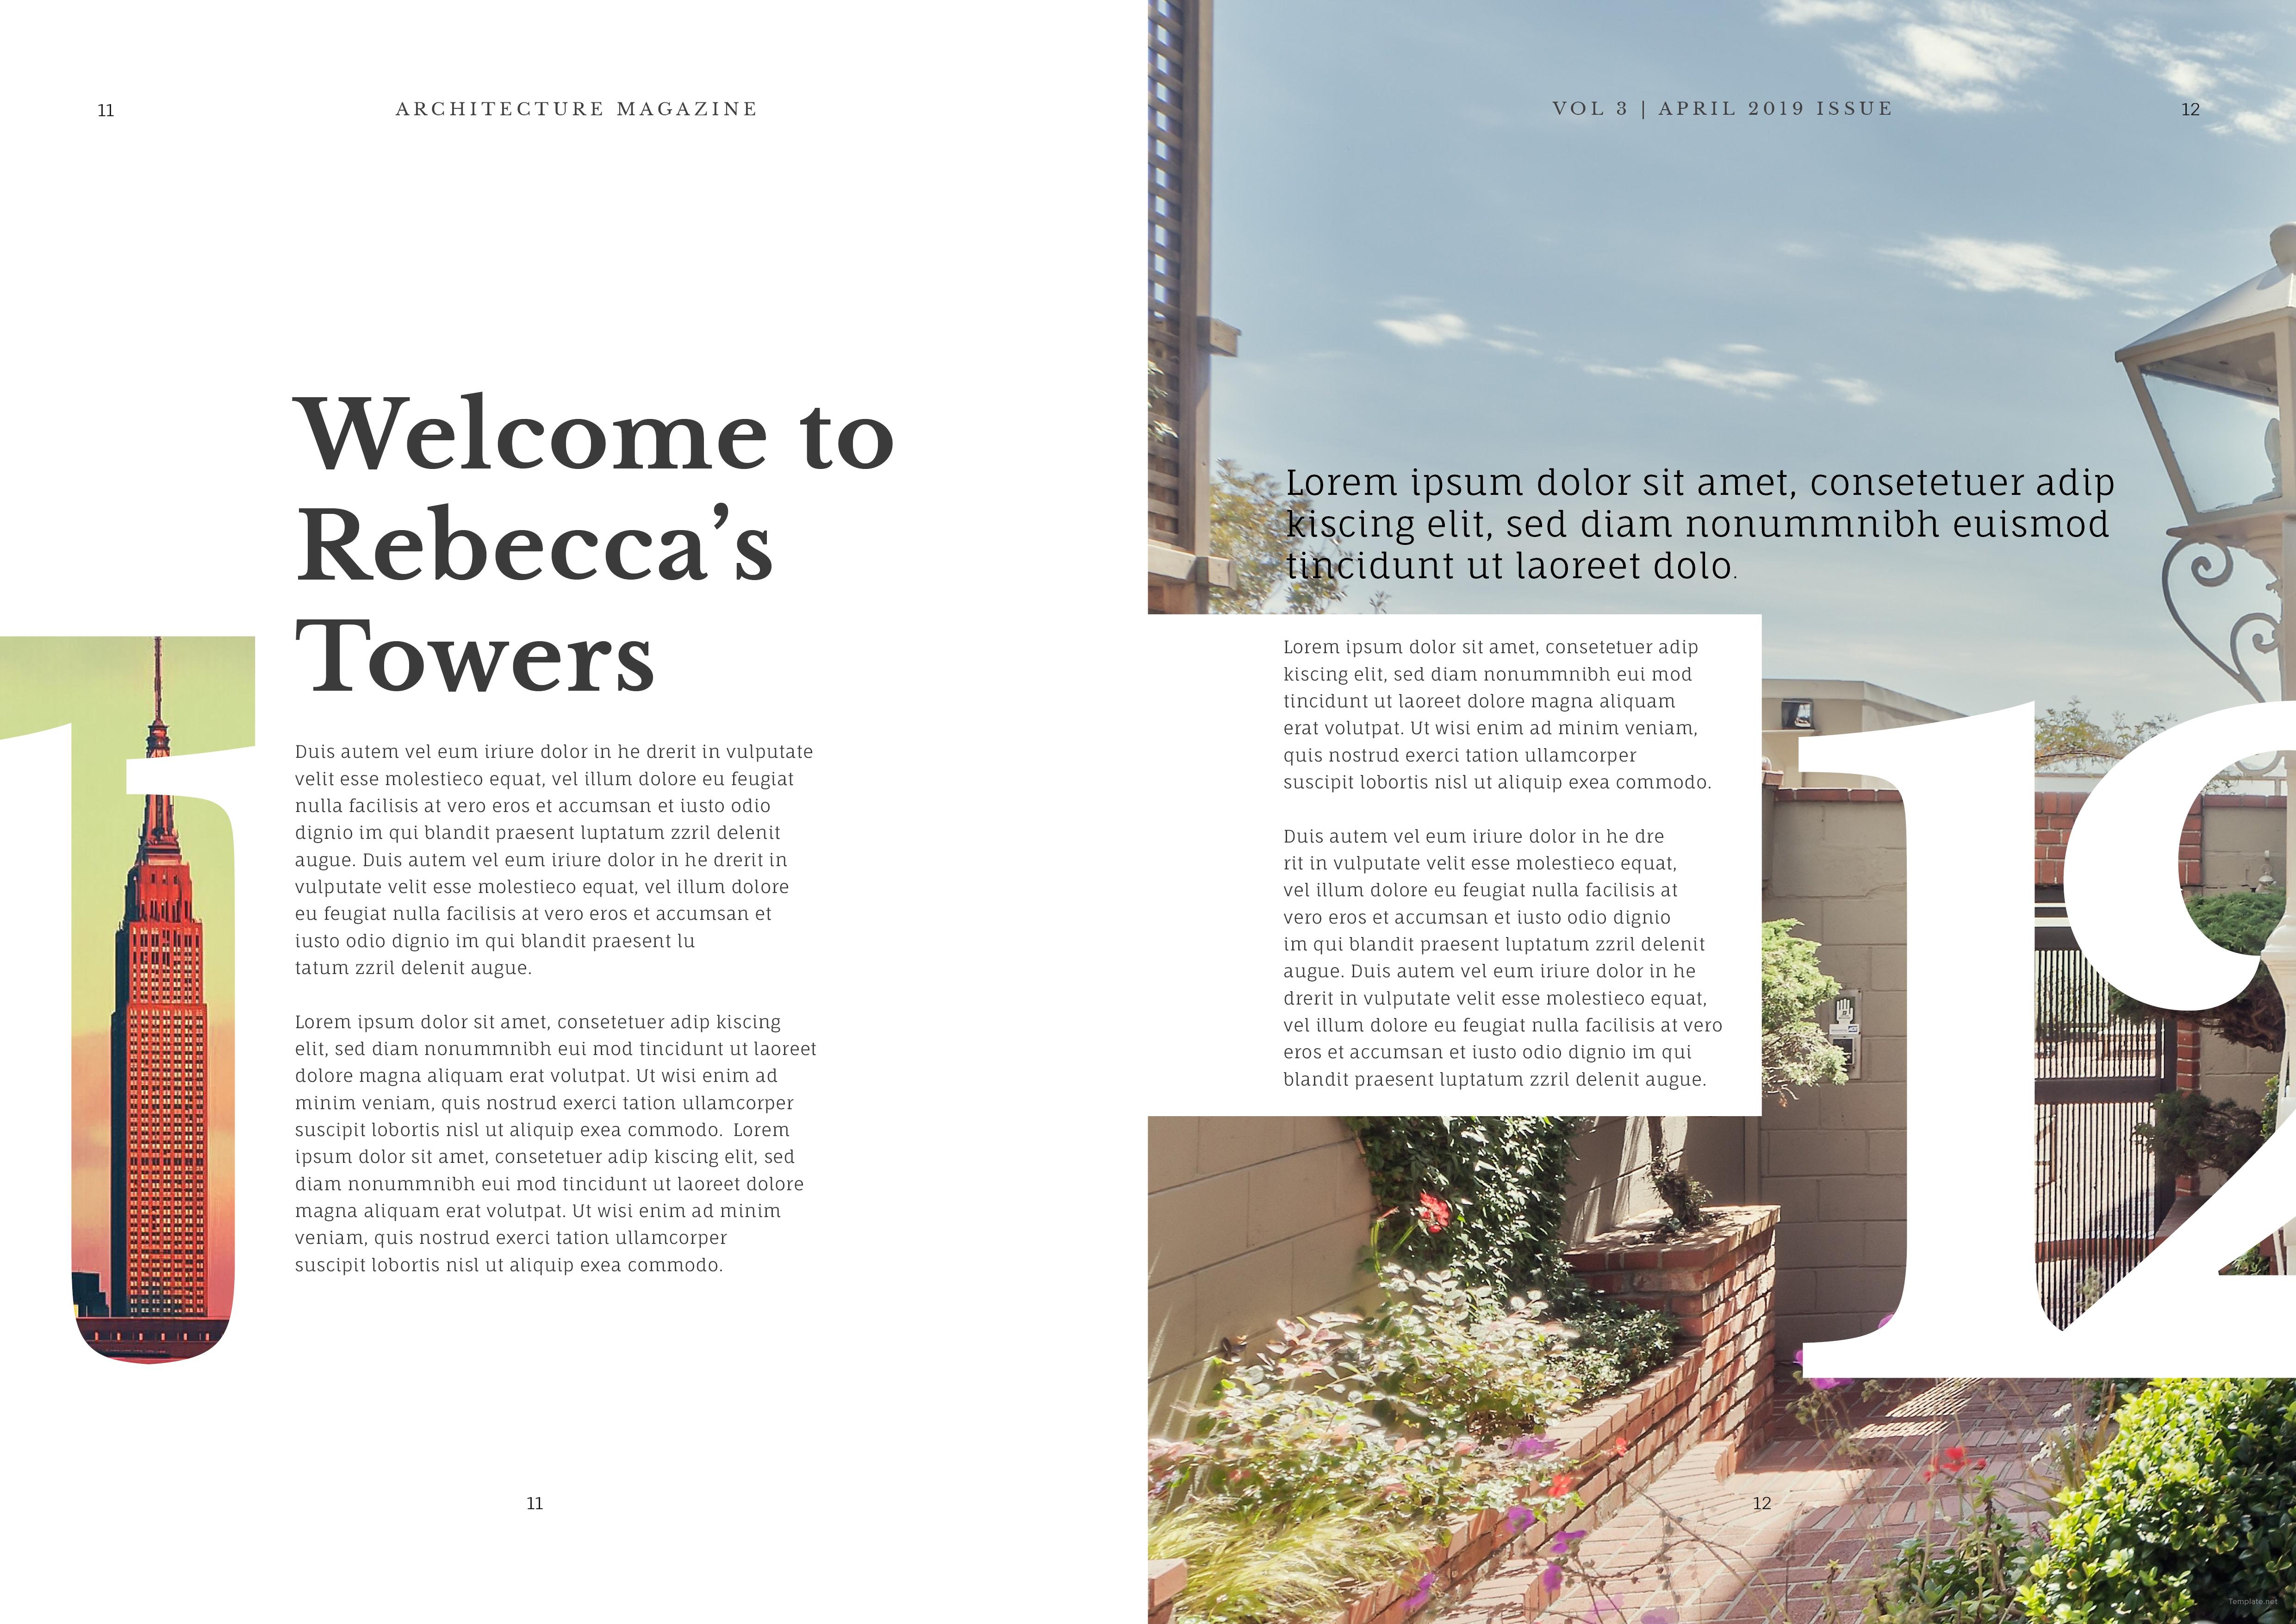 architecture magazine template - Free Architecture Magazines